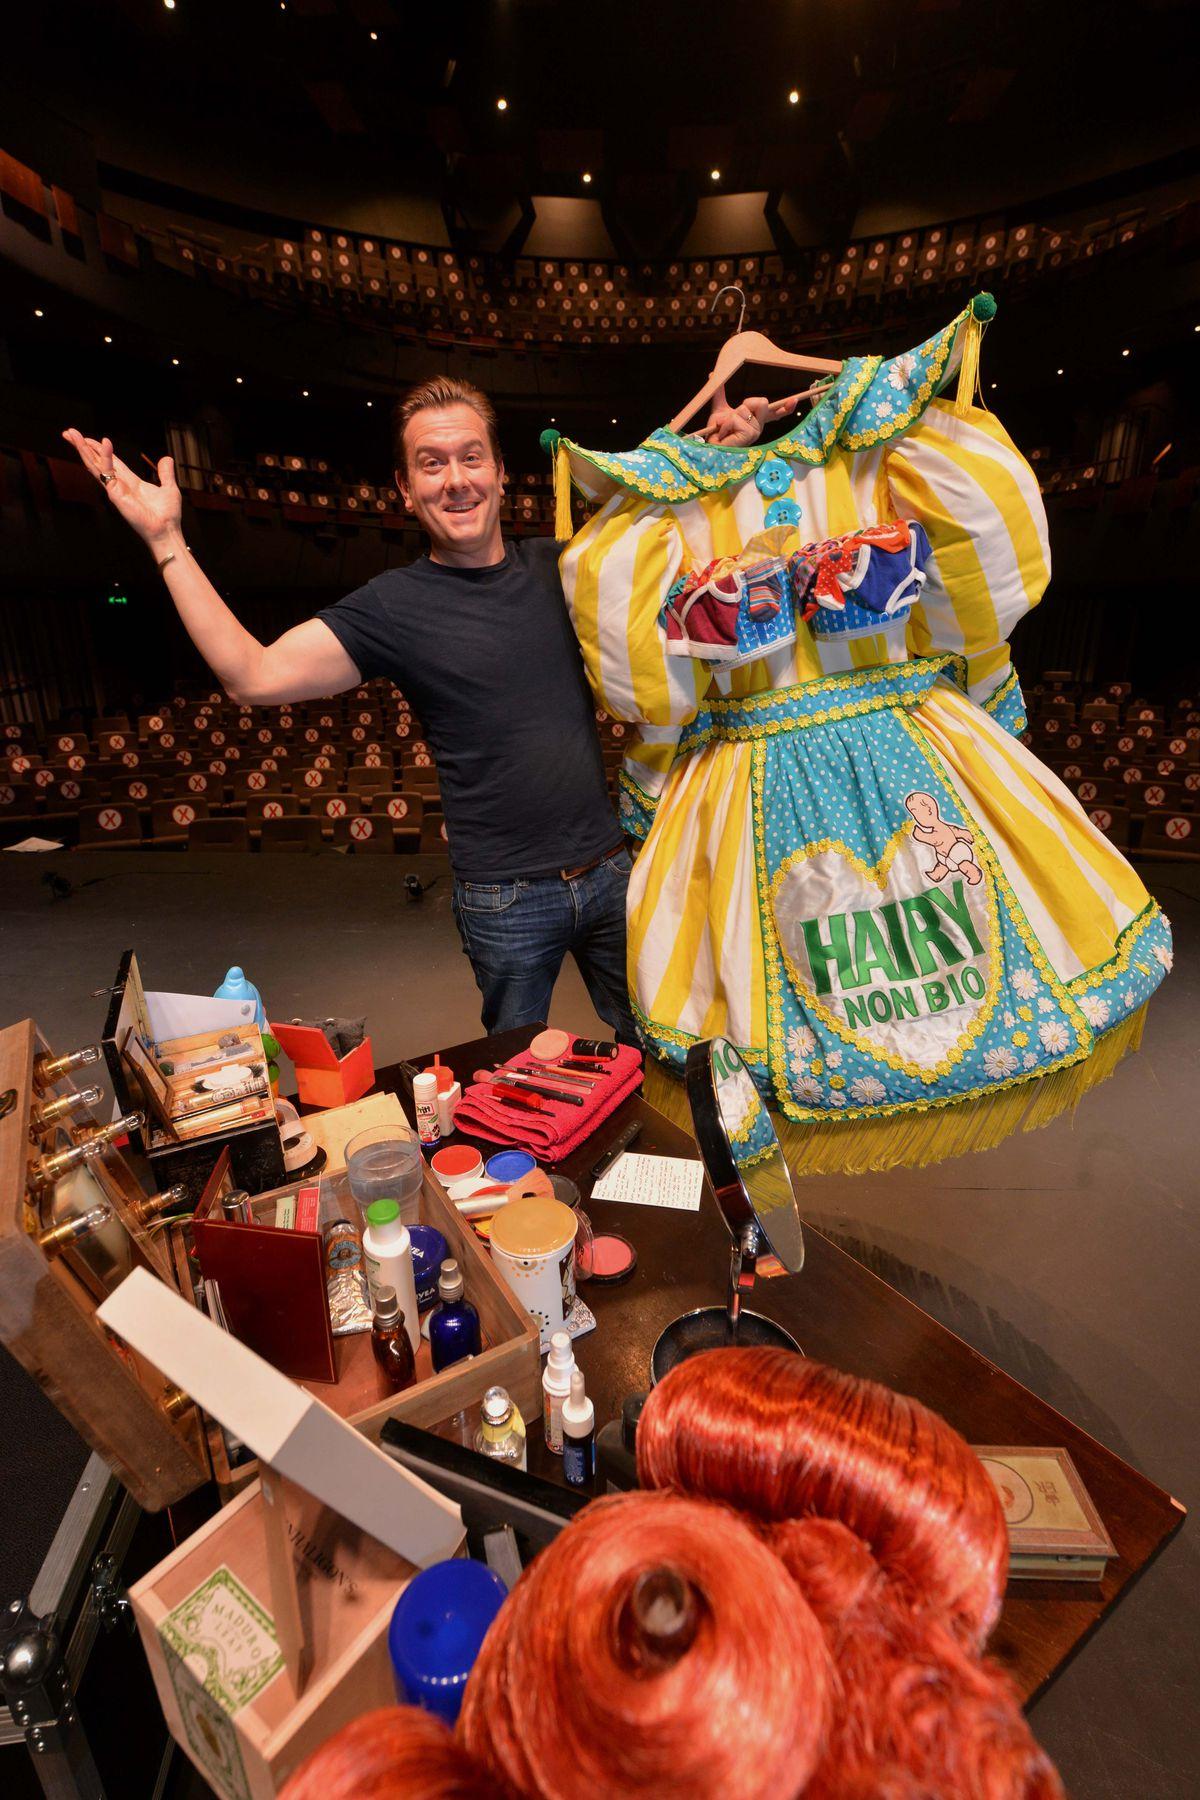 Panto dame Brad Fitt did perform a one-man show at Shrewsbury's Theatre Severn